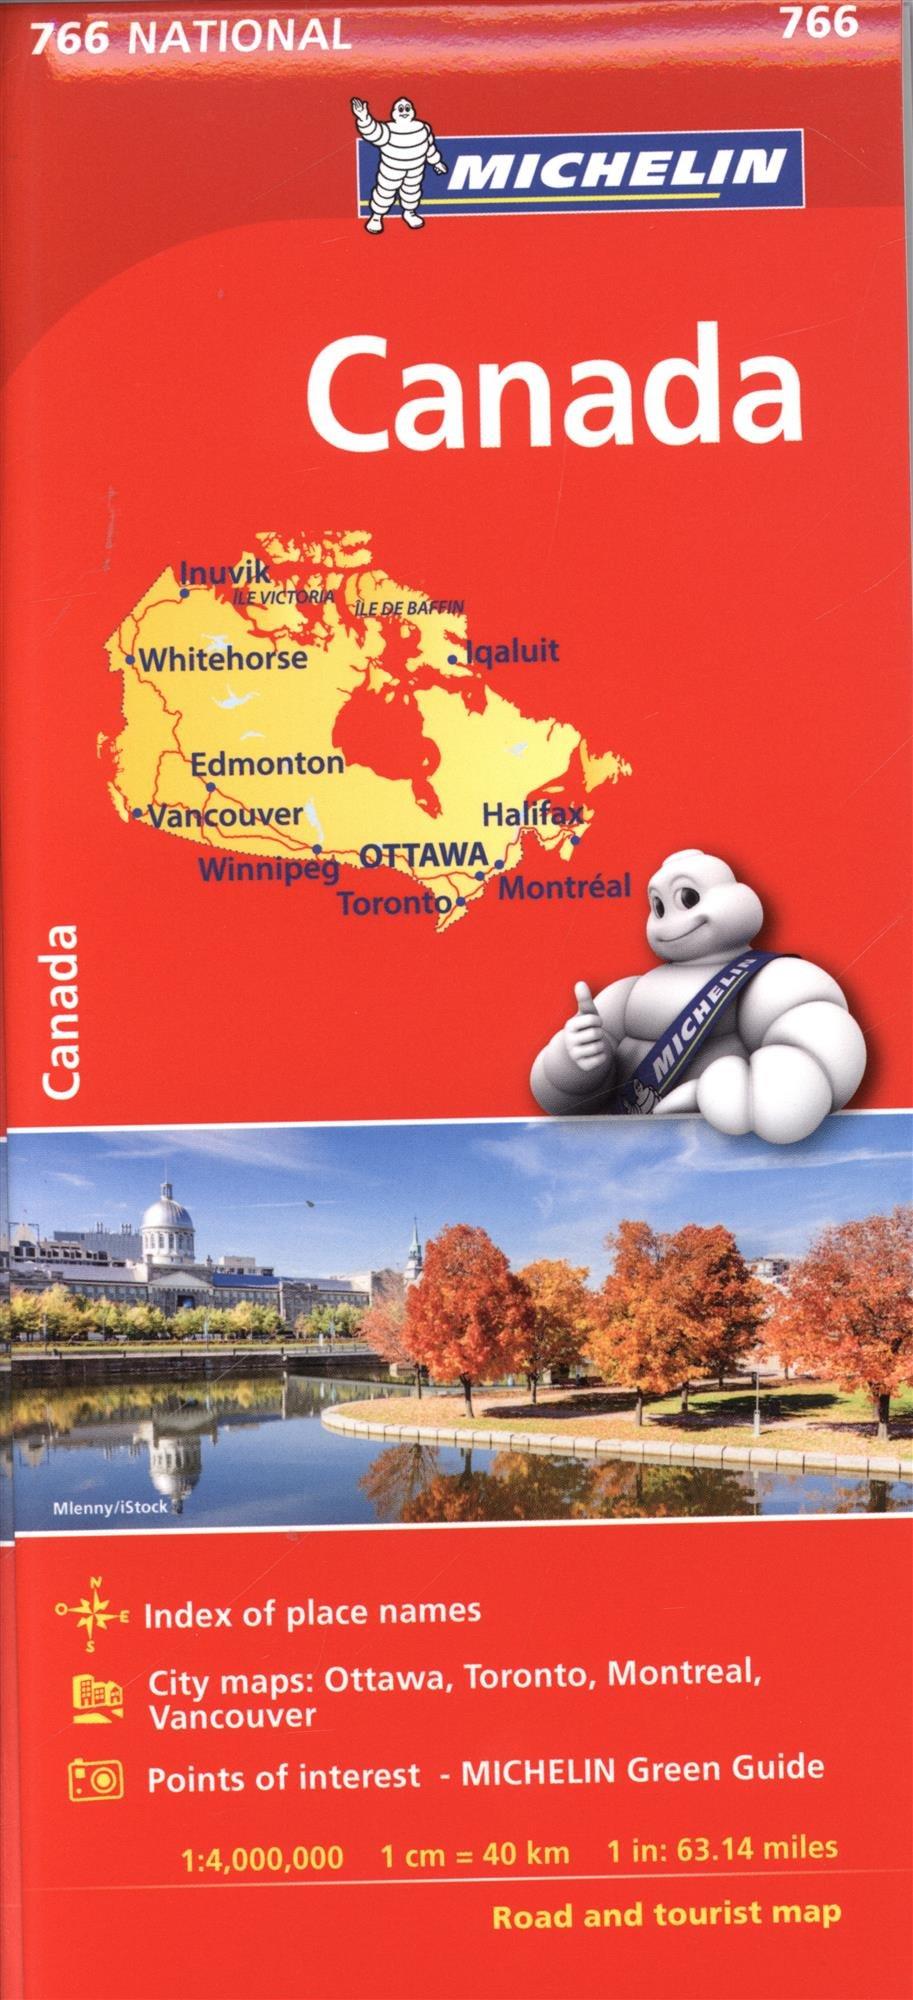 Michelin Canada Map # 766 (Michelin National) ebook